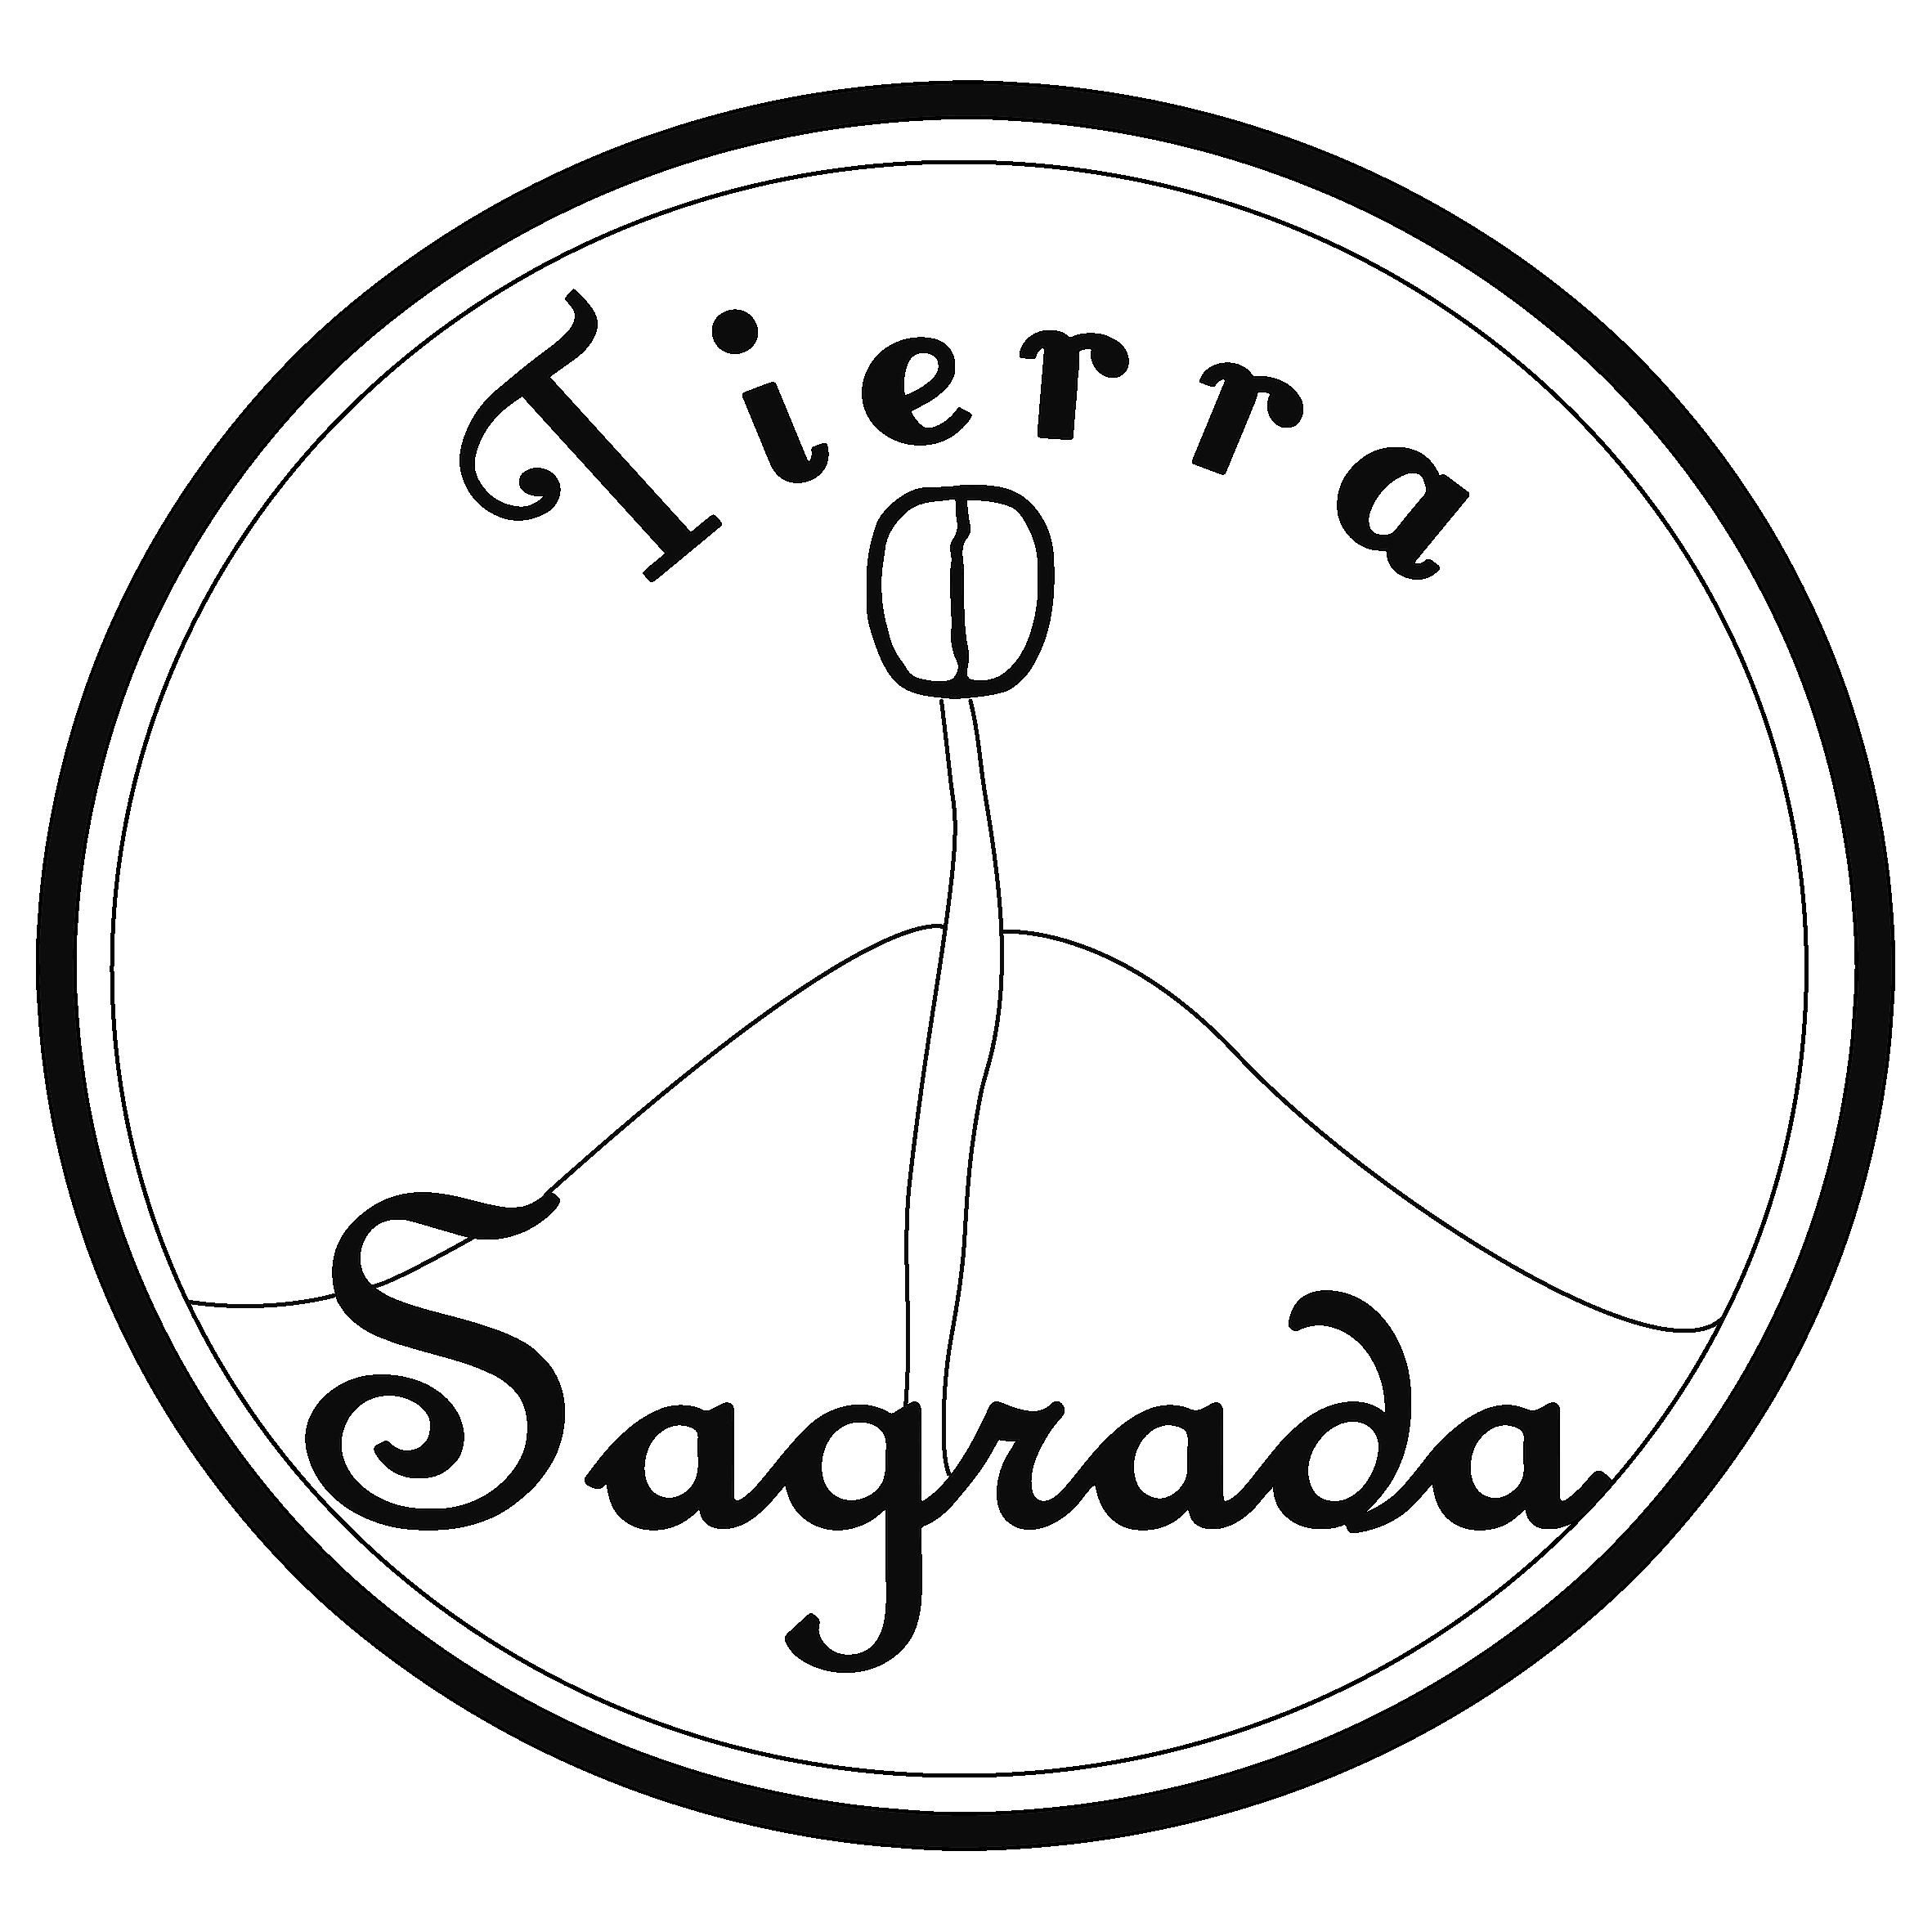 CAFE TIERRA SAGRADA